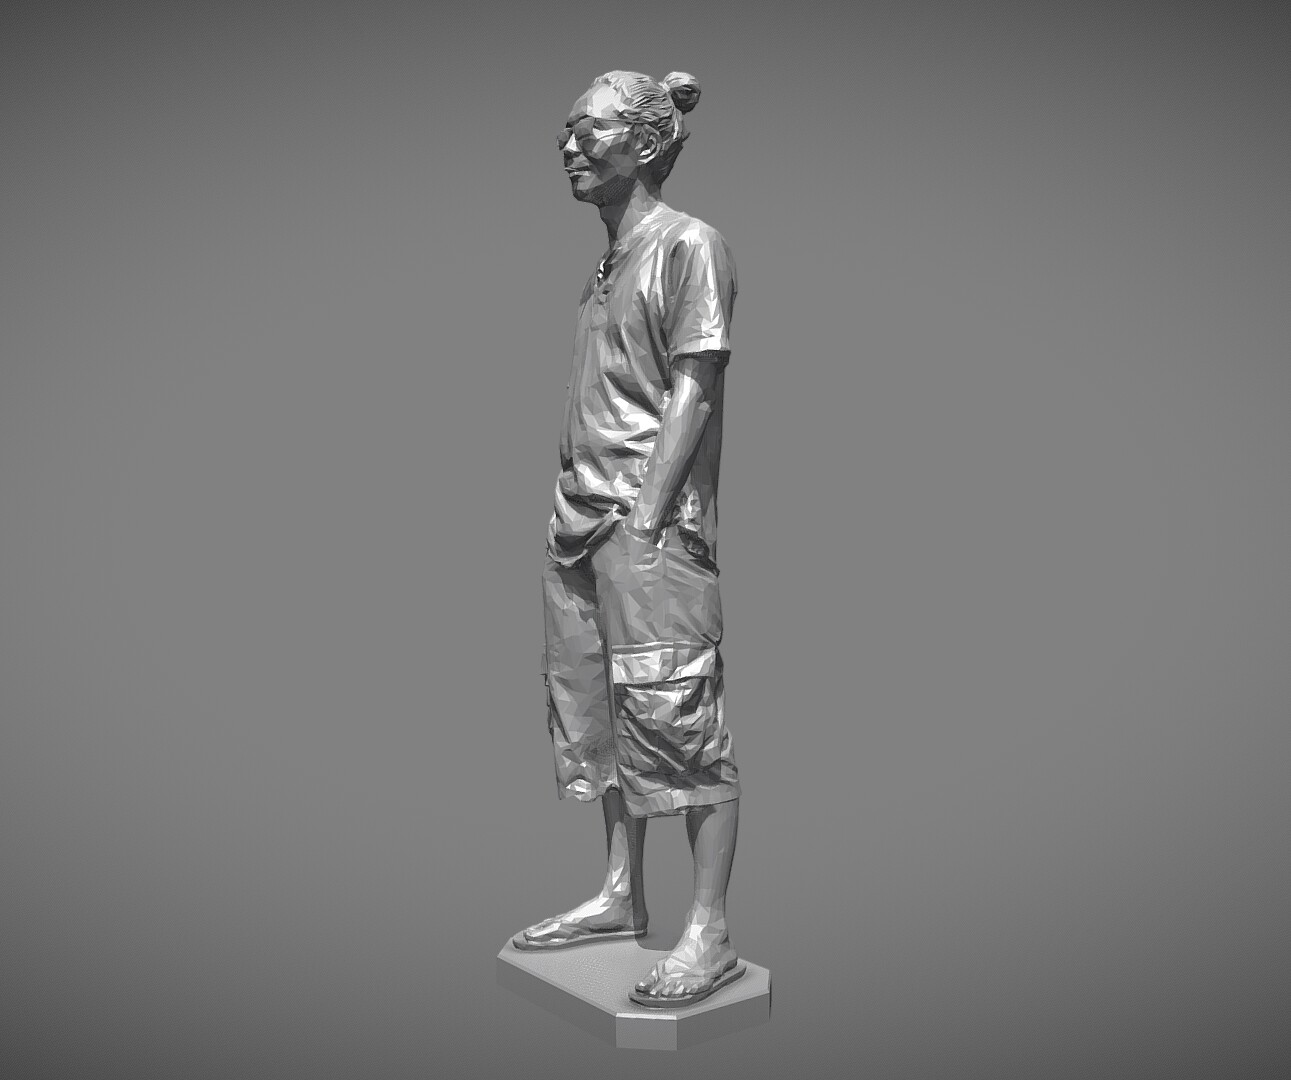 Michael wu 3d models by mwopus mwopus sketchfab20190320 007956